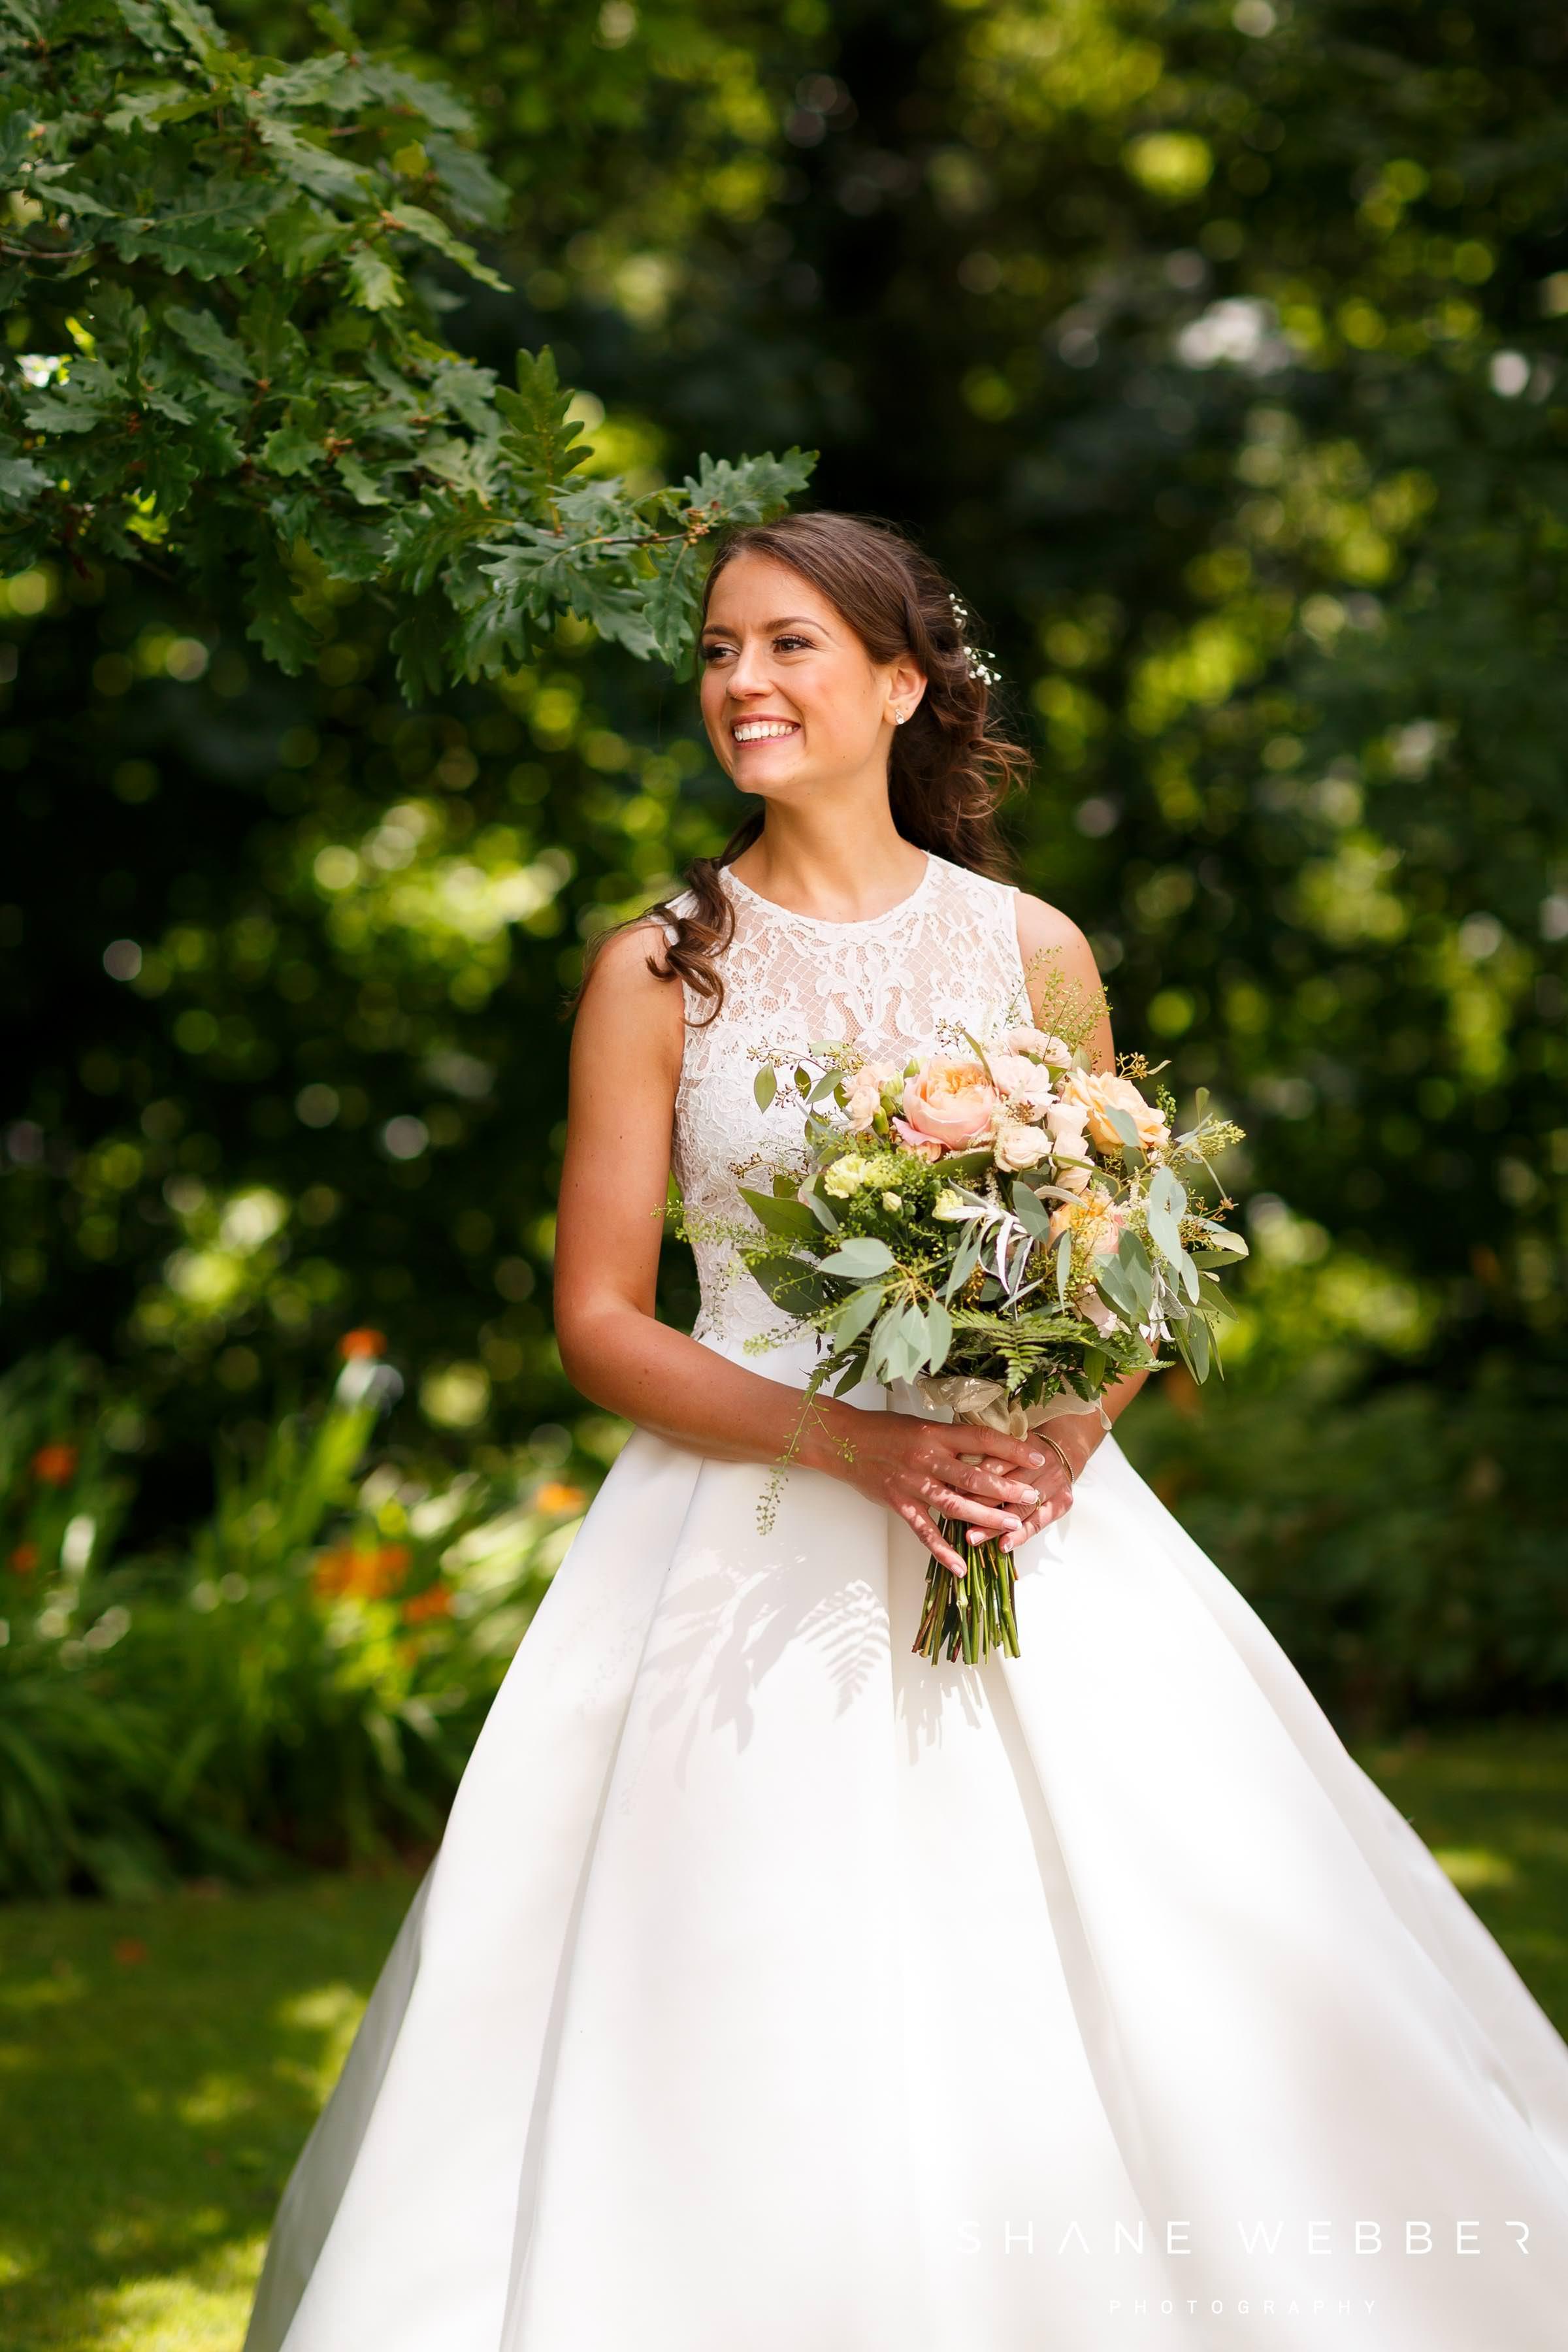 Thorpe Gardens weddings